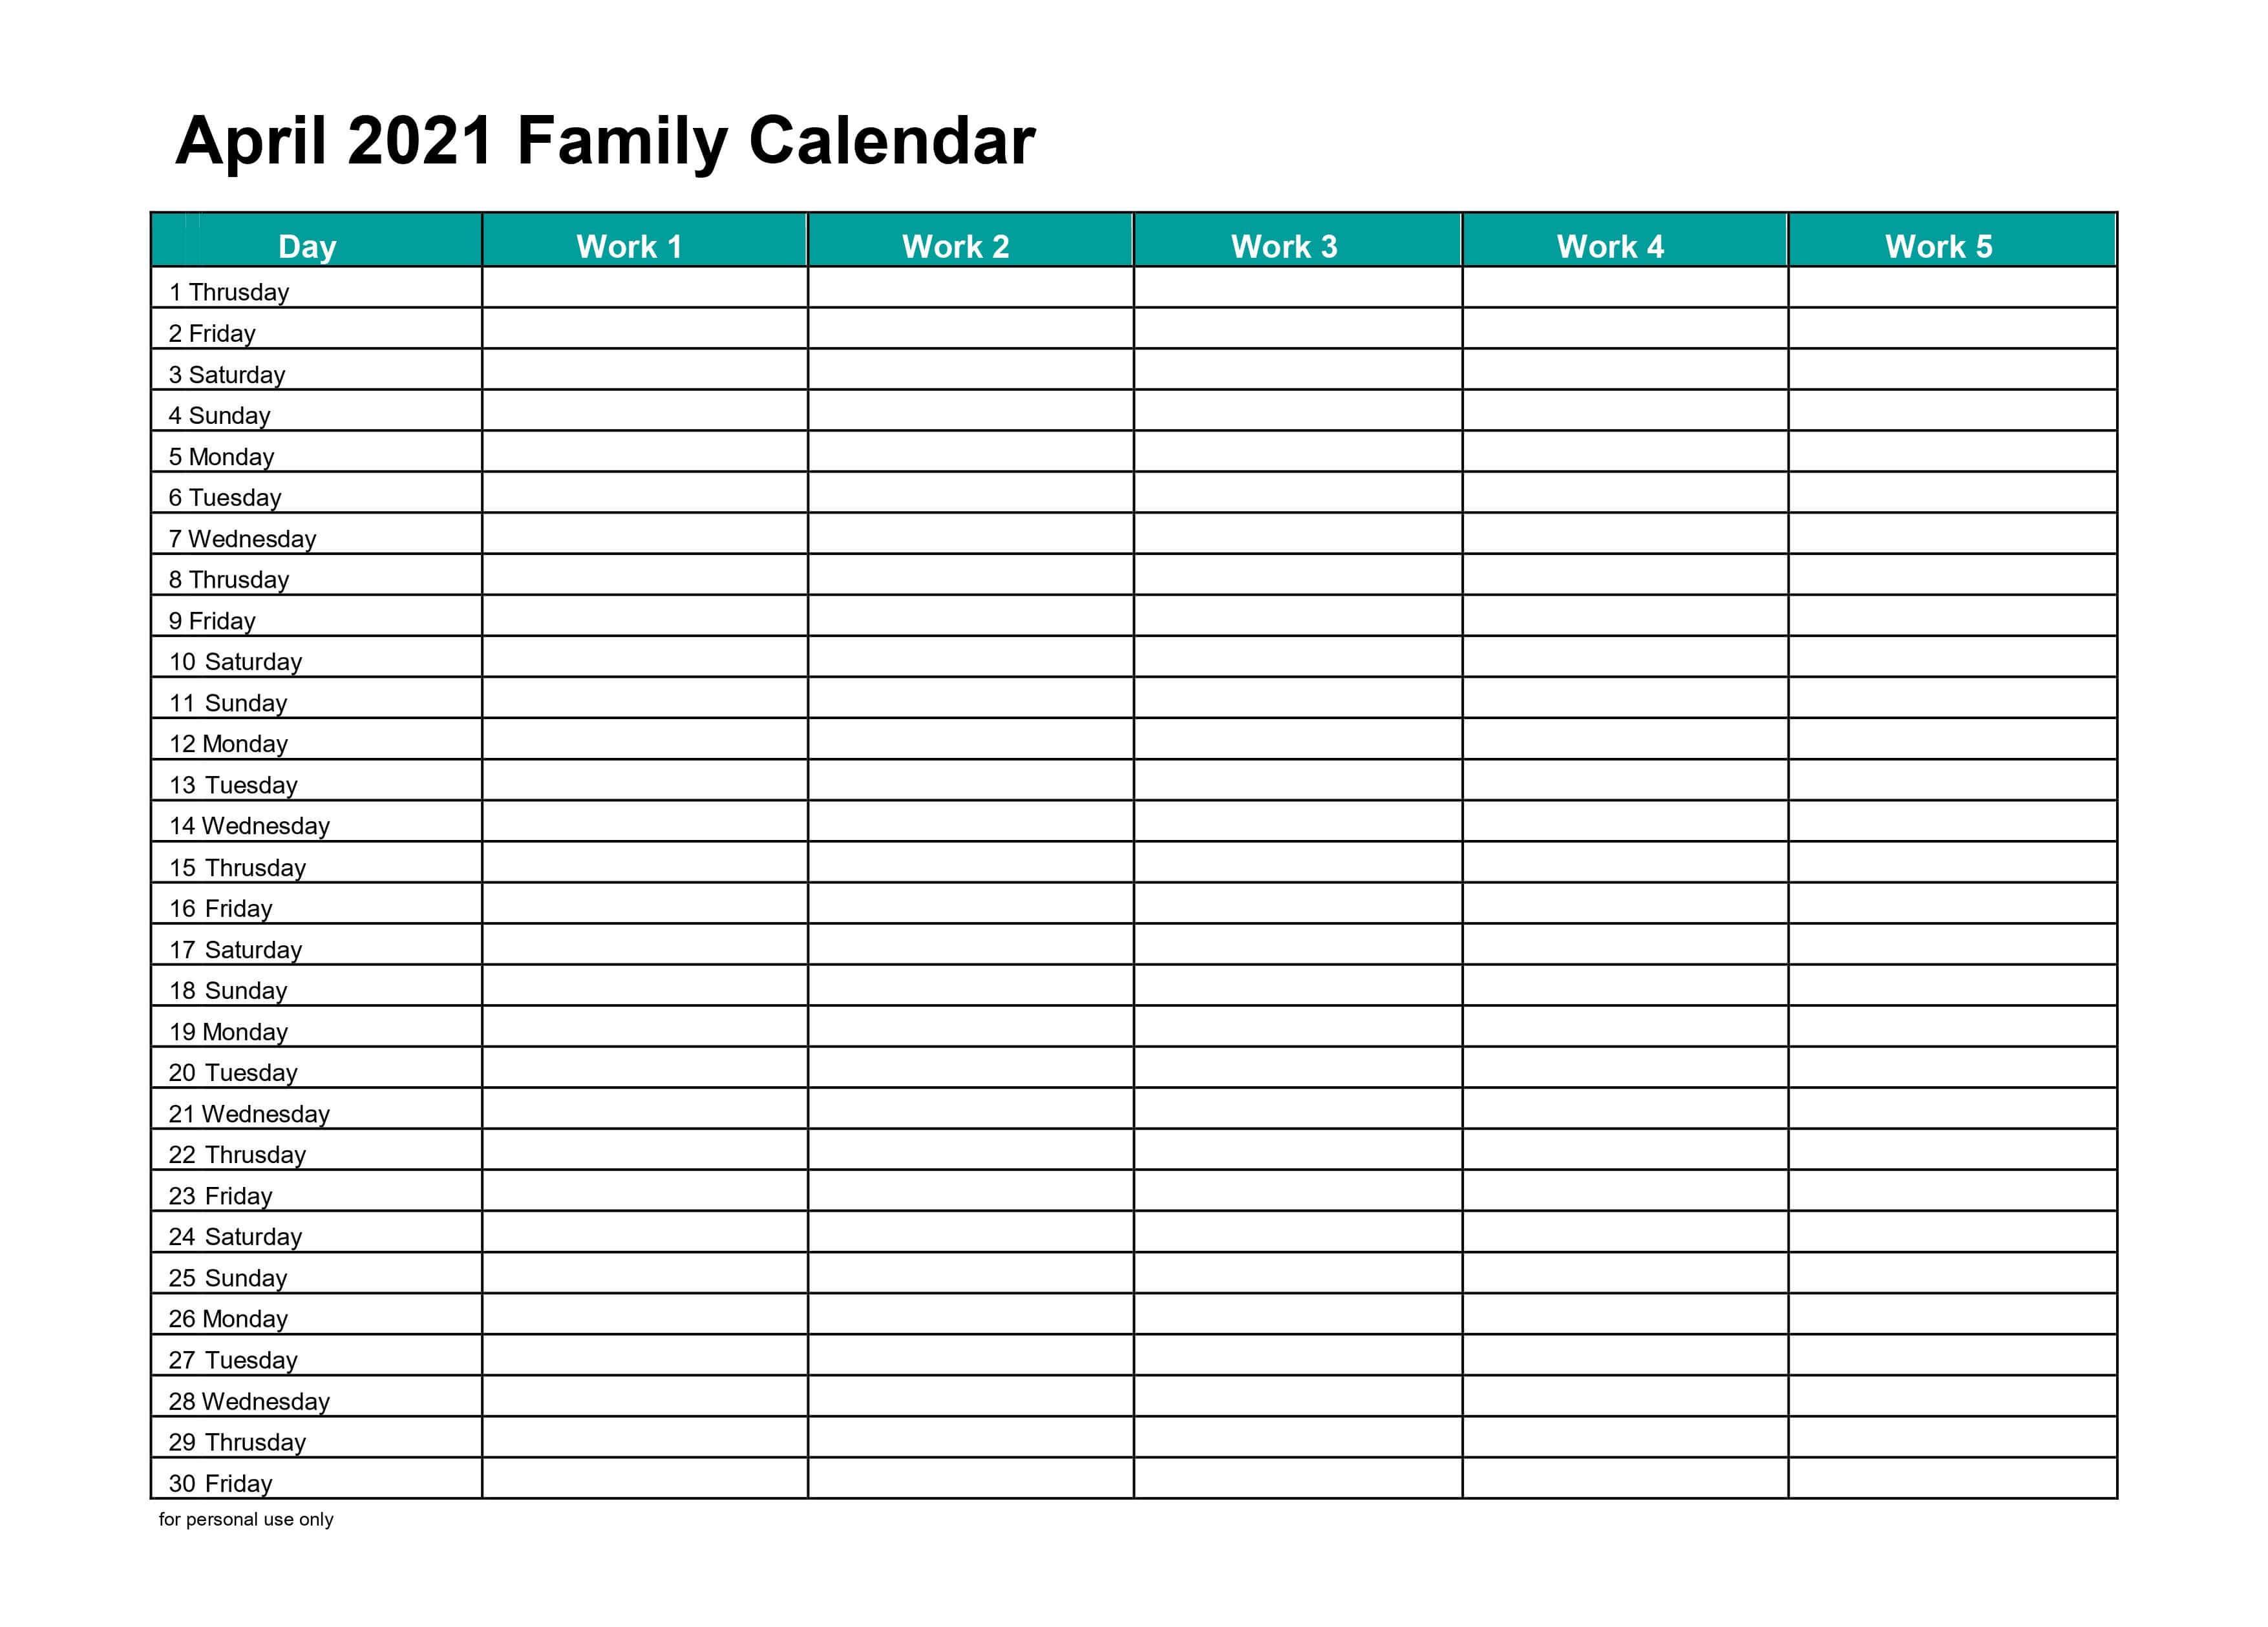 Blank April 2021 Family Calendar